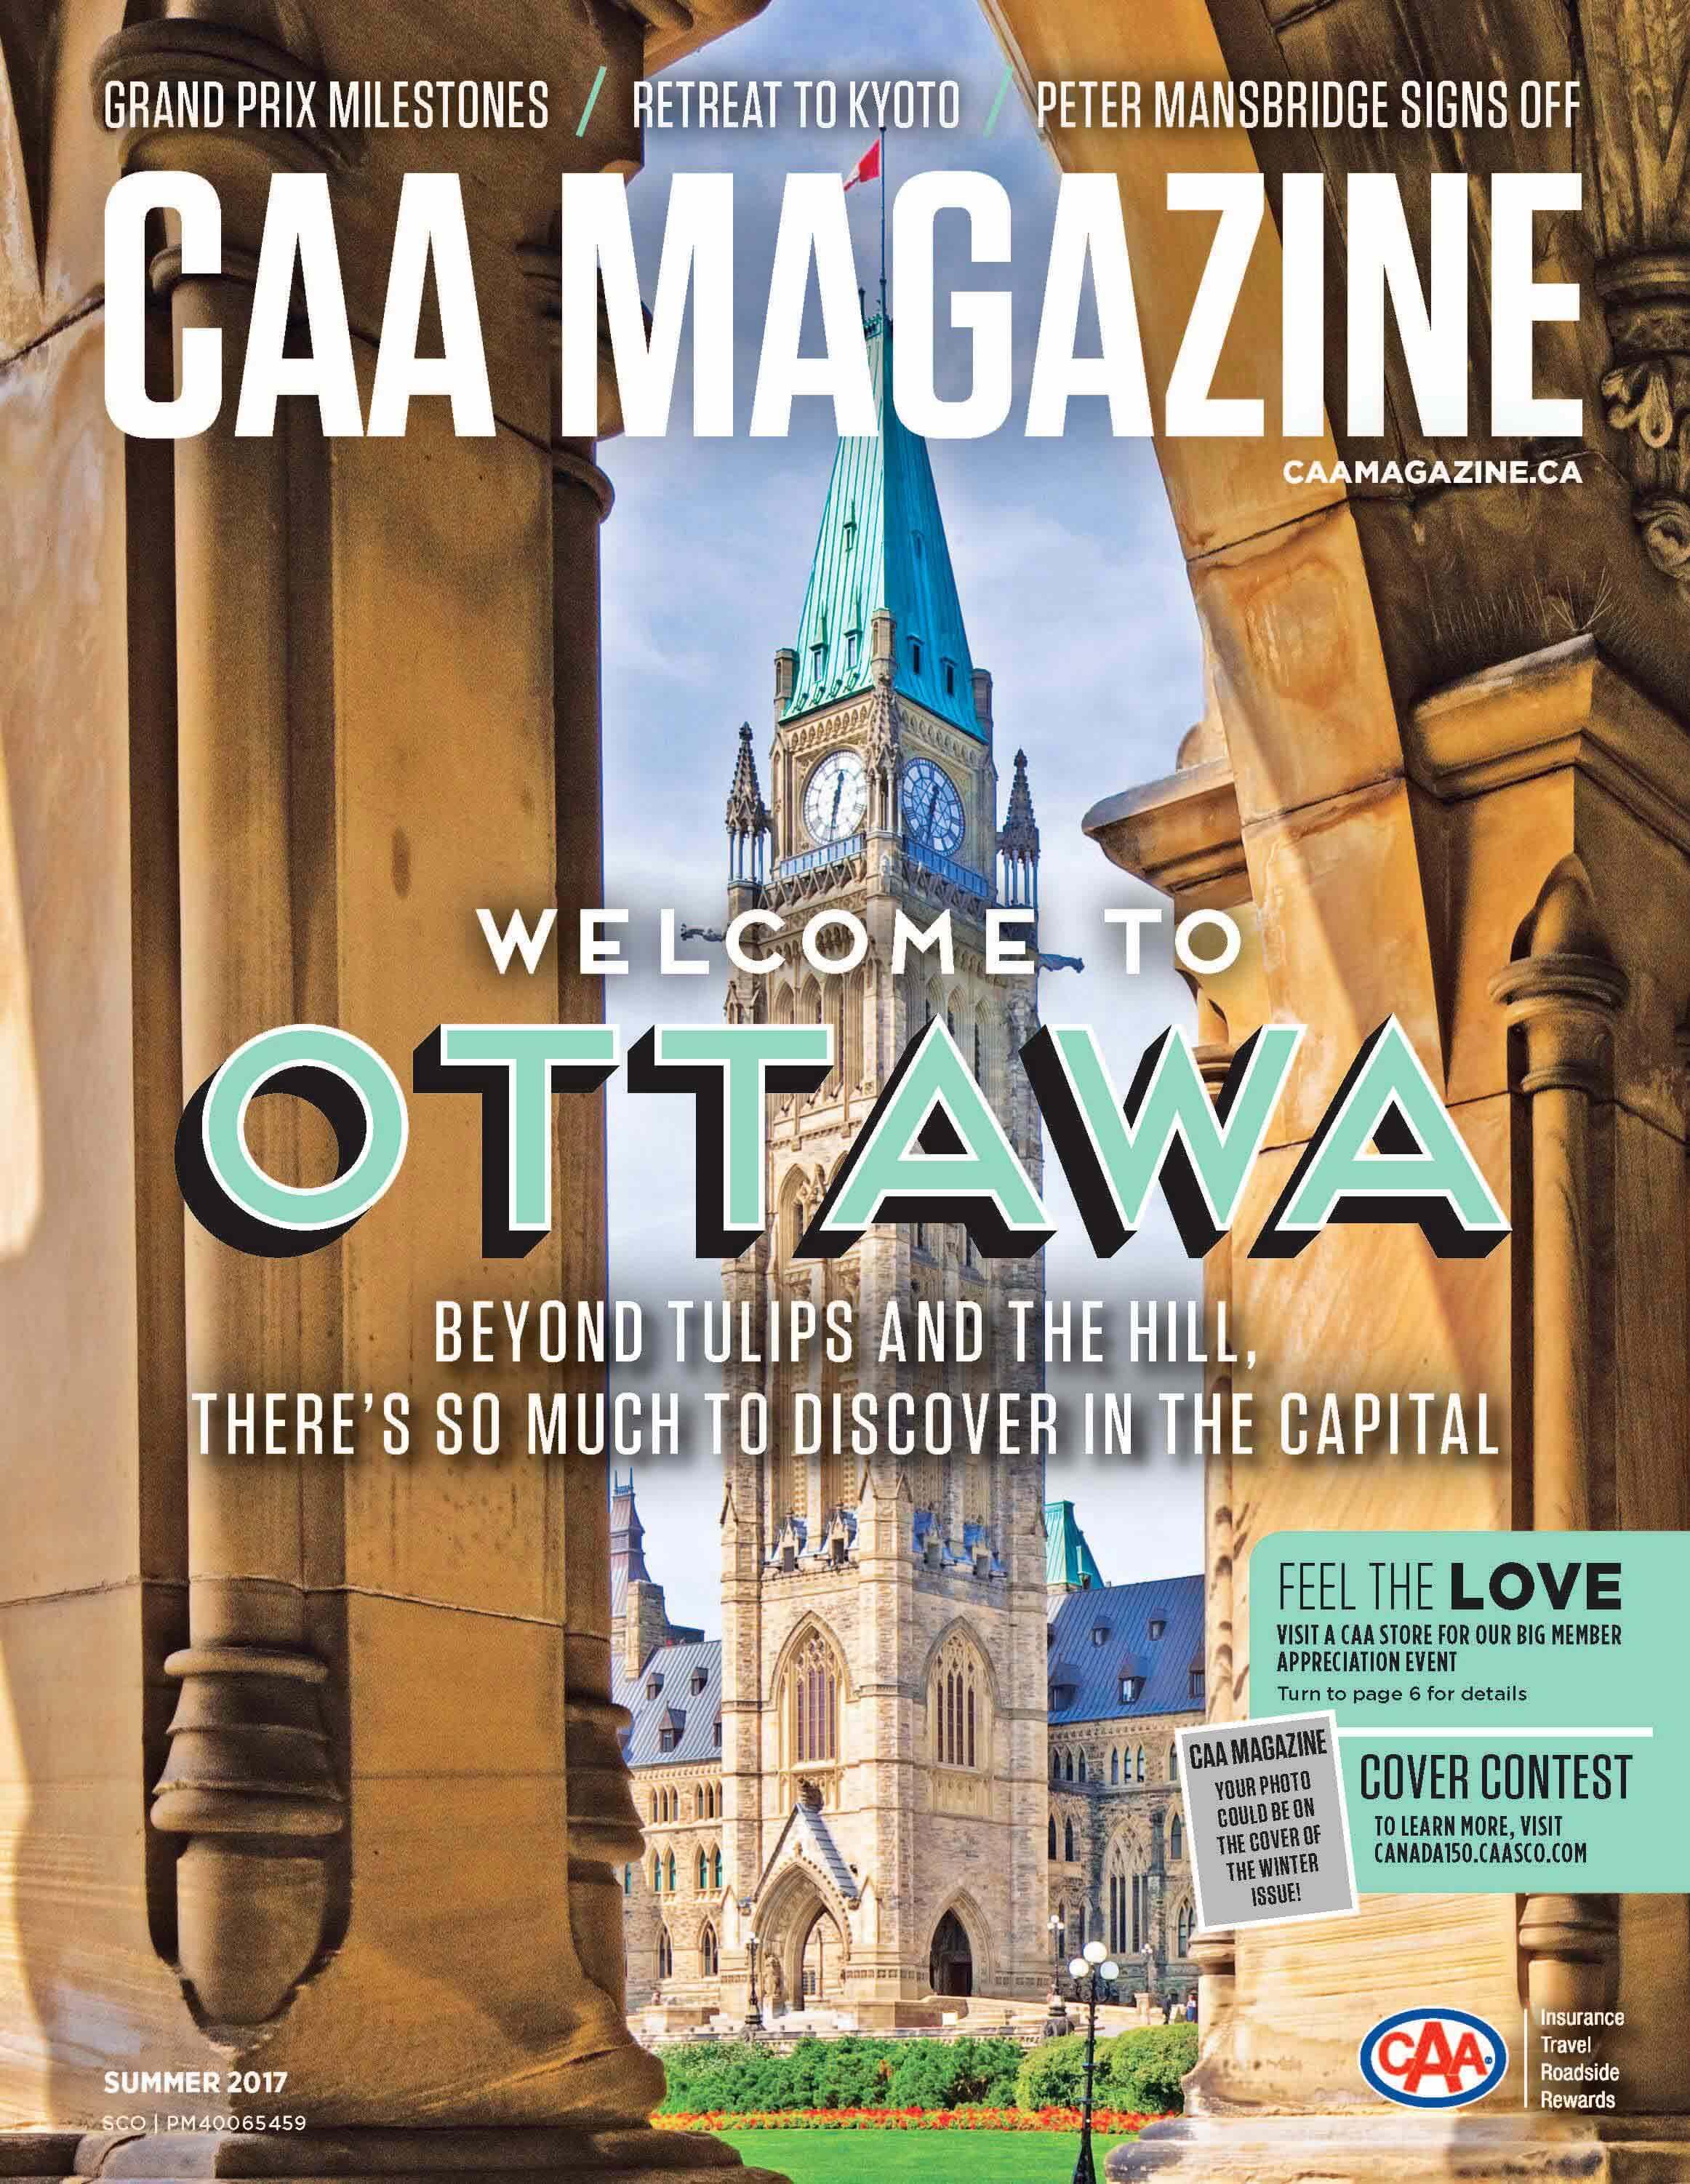 Caa Car Insurance Quote Canada - 44billionlater